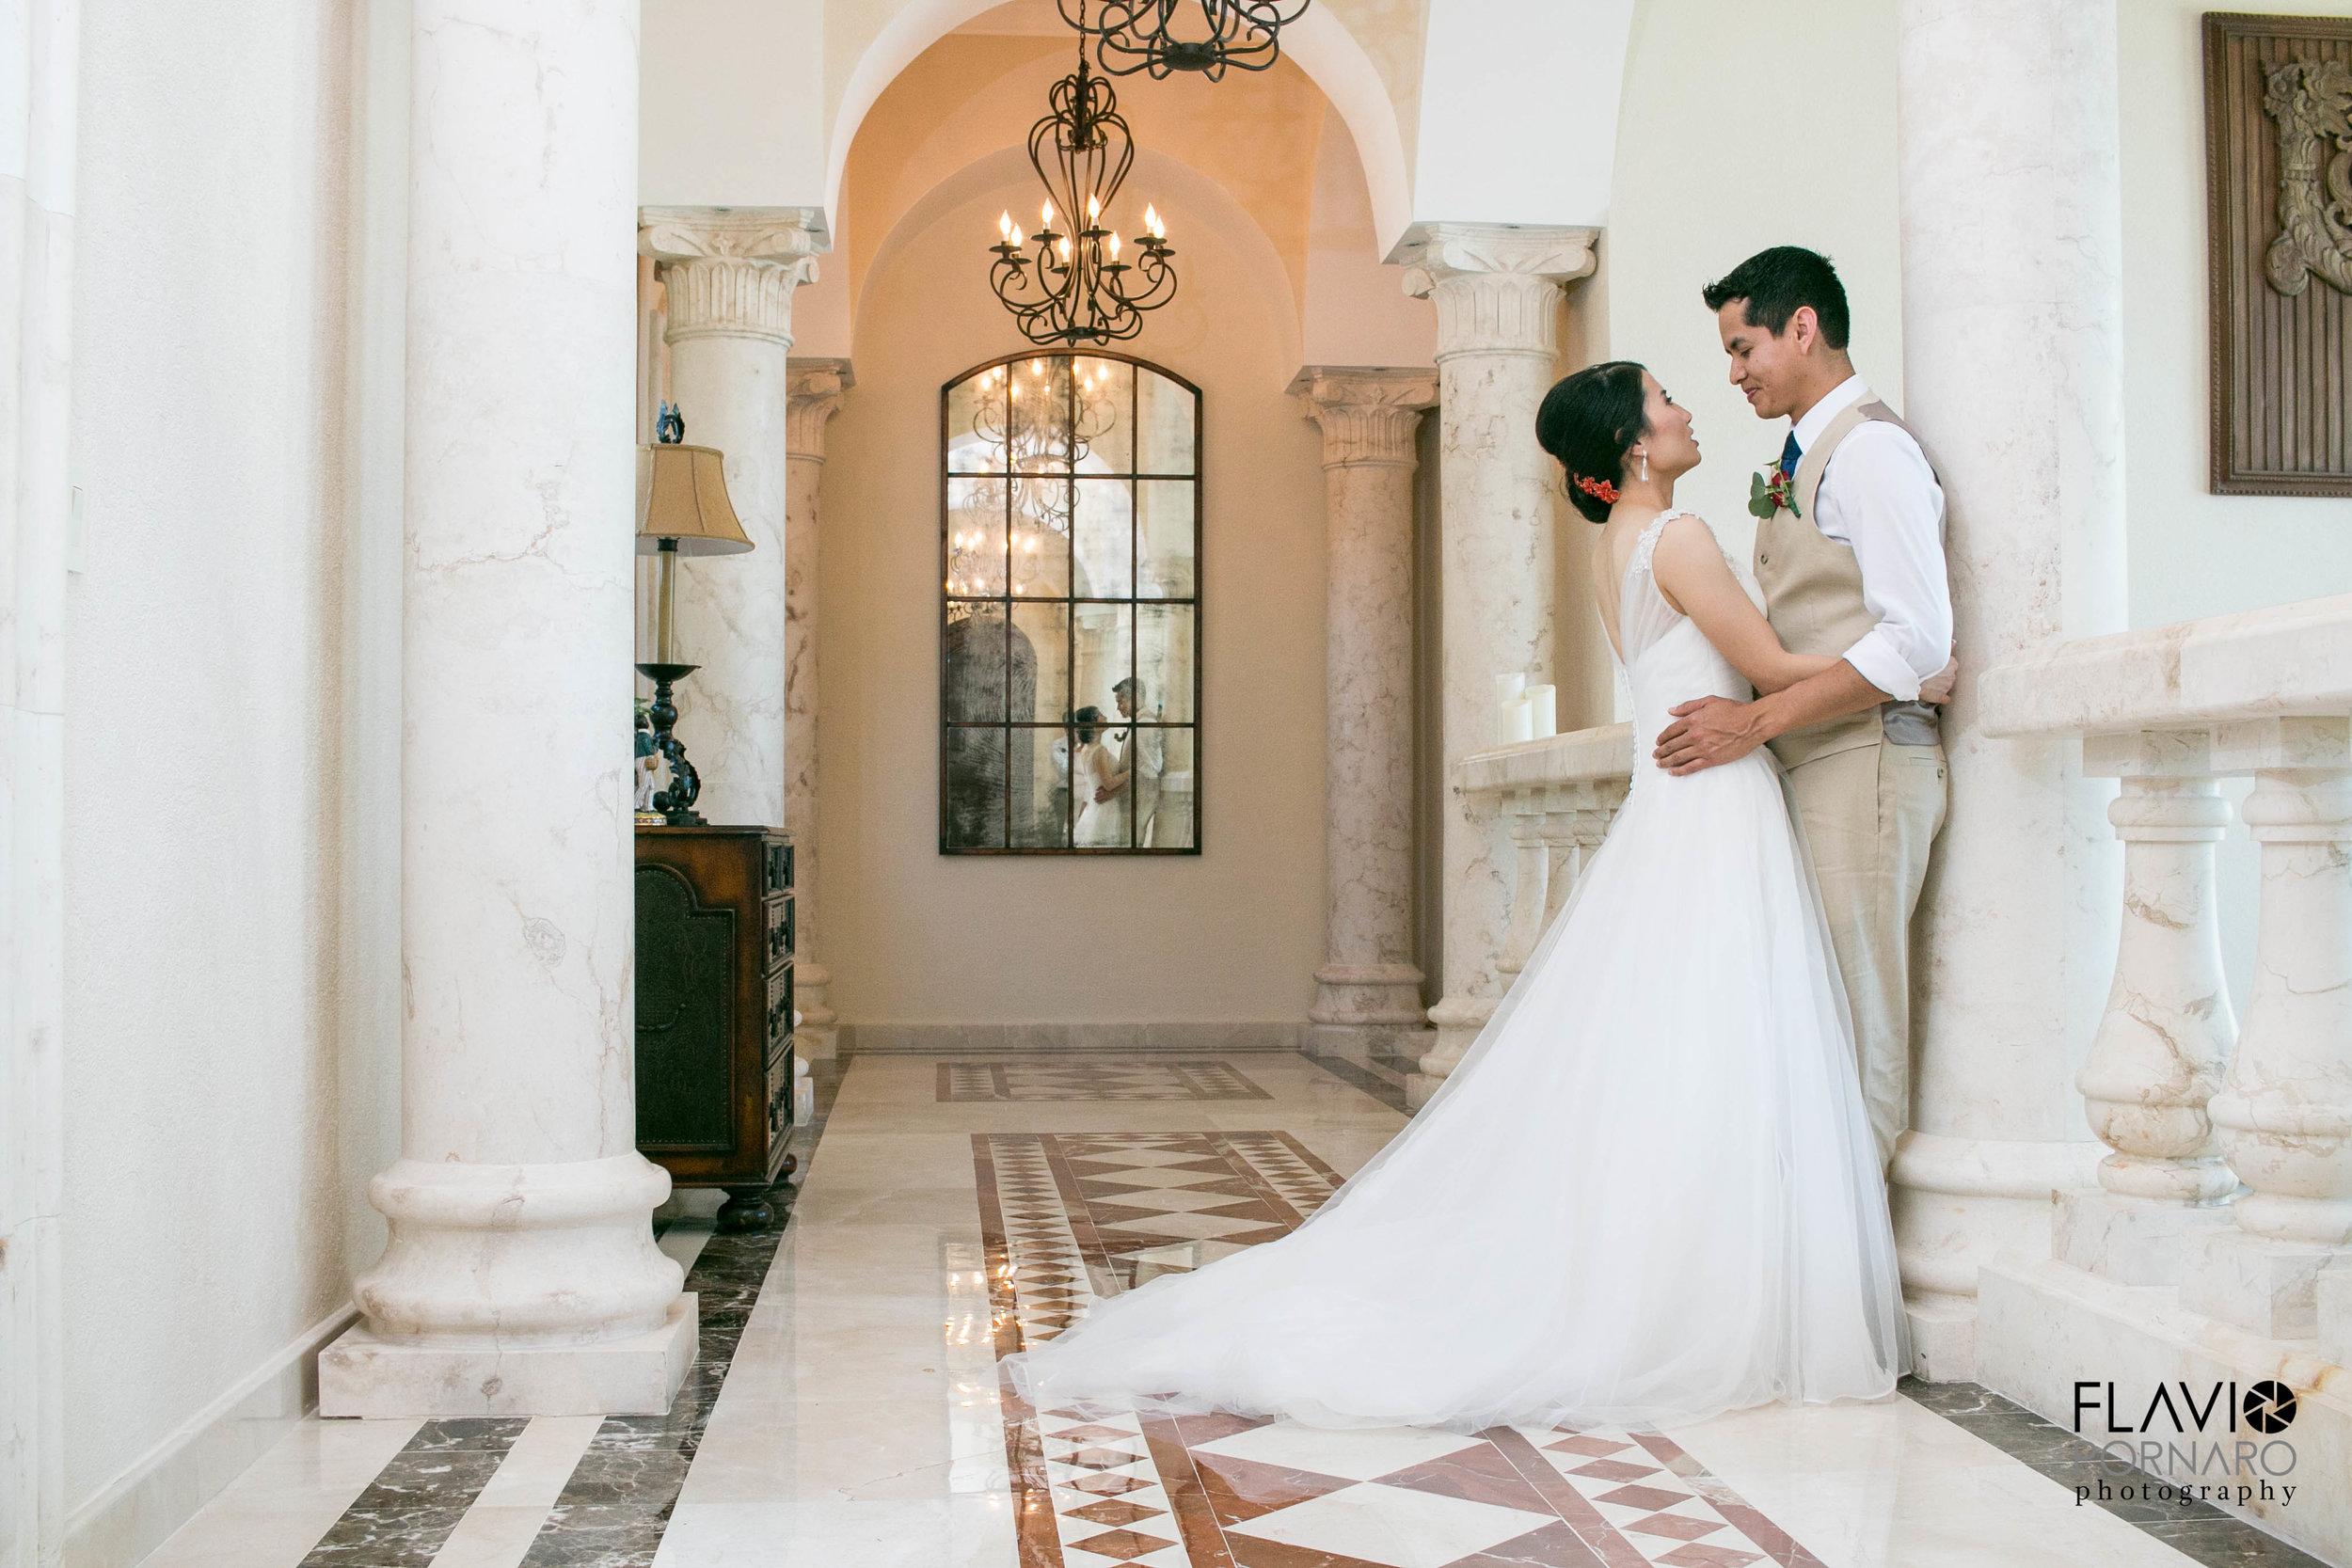 cancun-desination-wedding-villa-la-joya-08.jpg